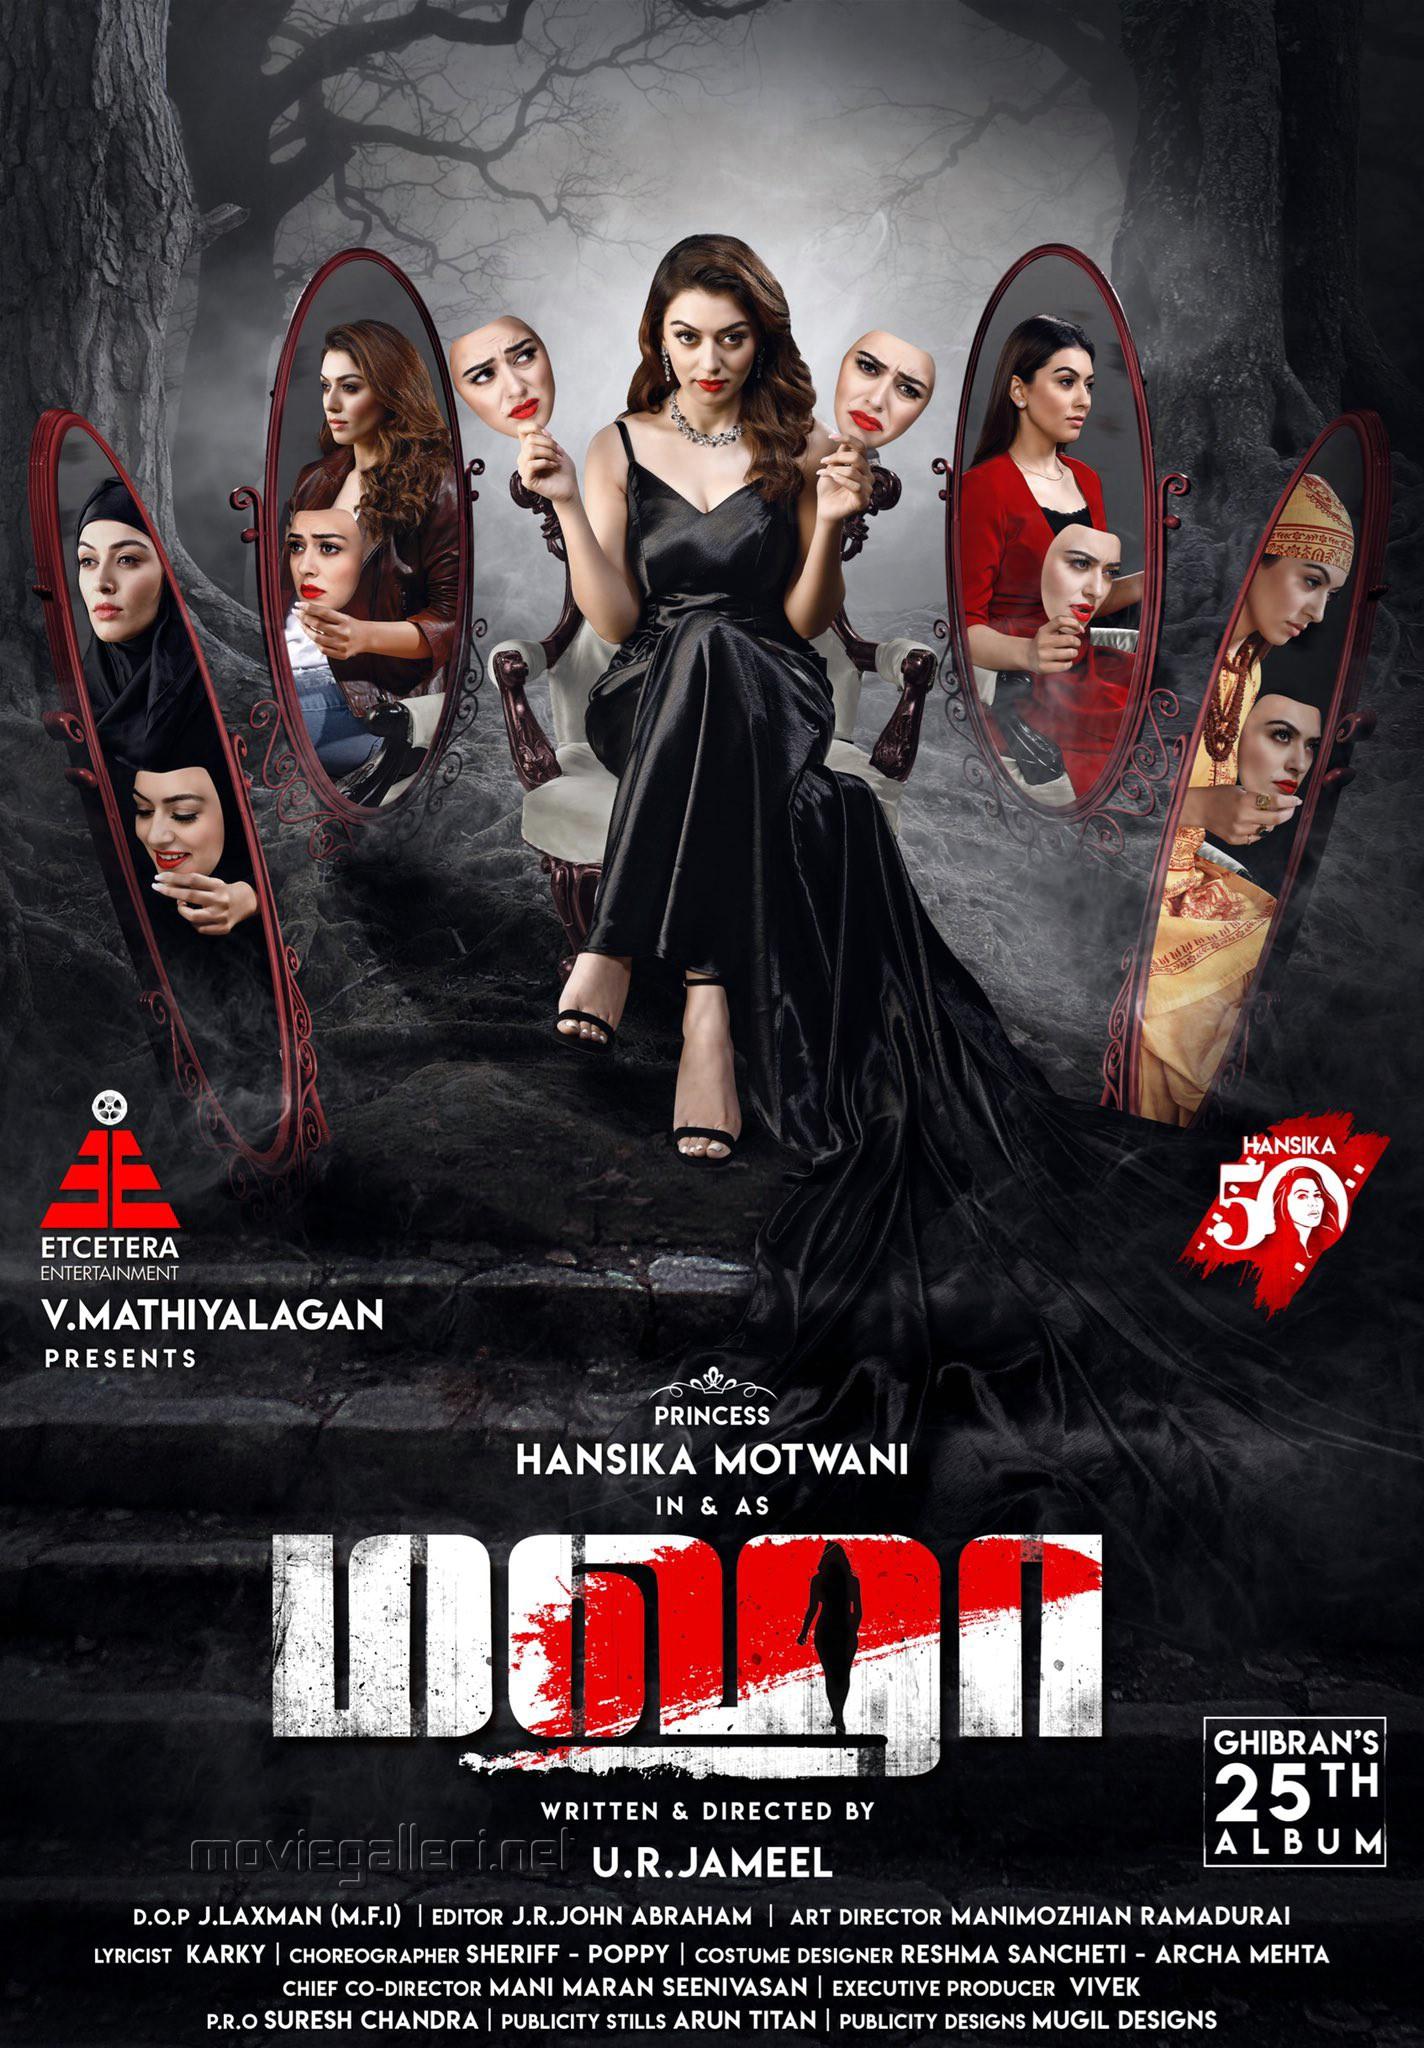 Hansika Motwani Maha Movie first look poster HD